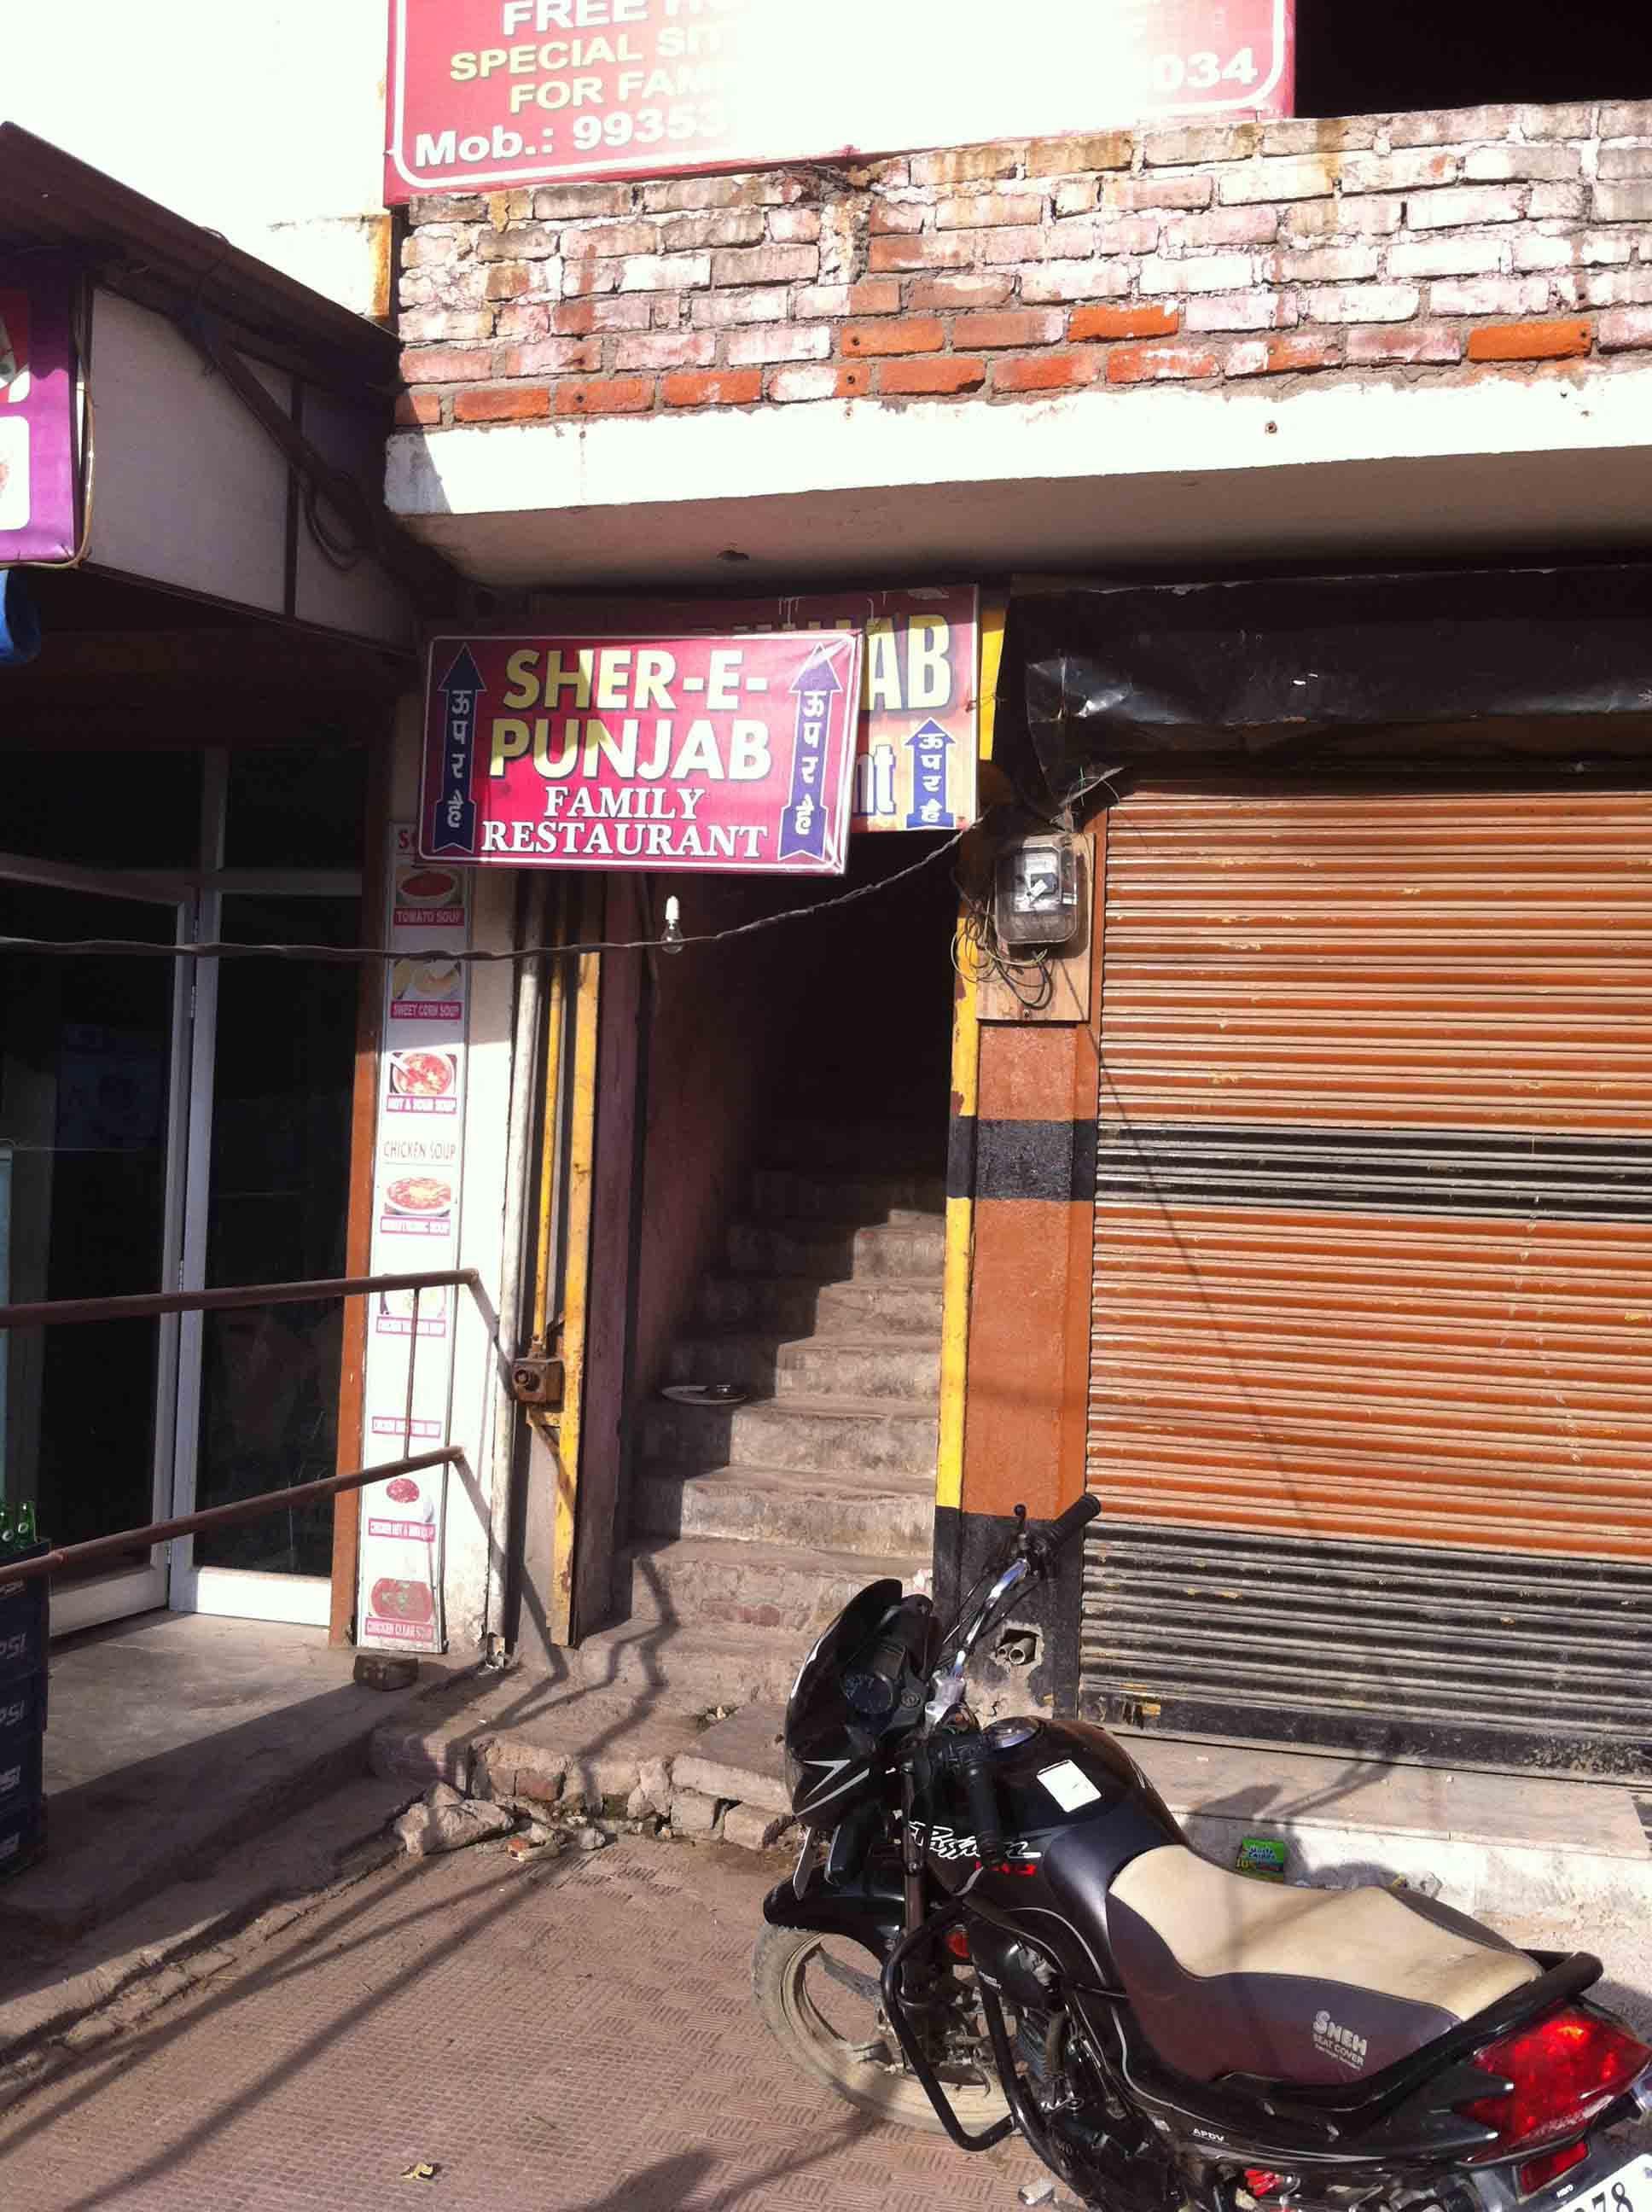 Sher E Punjab Dhaba & Restaurant - Lal Bangla - Kanpur Image